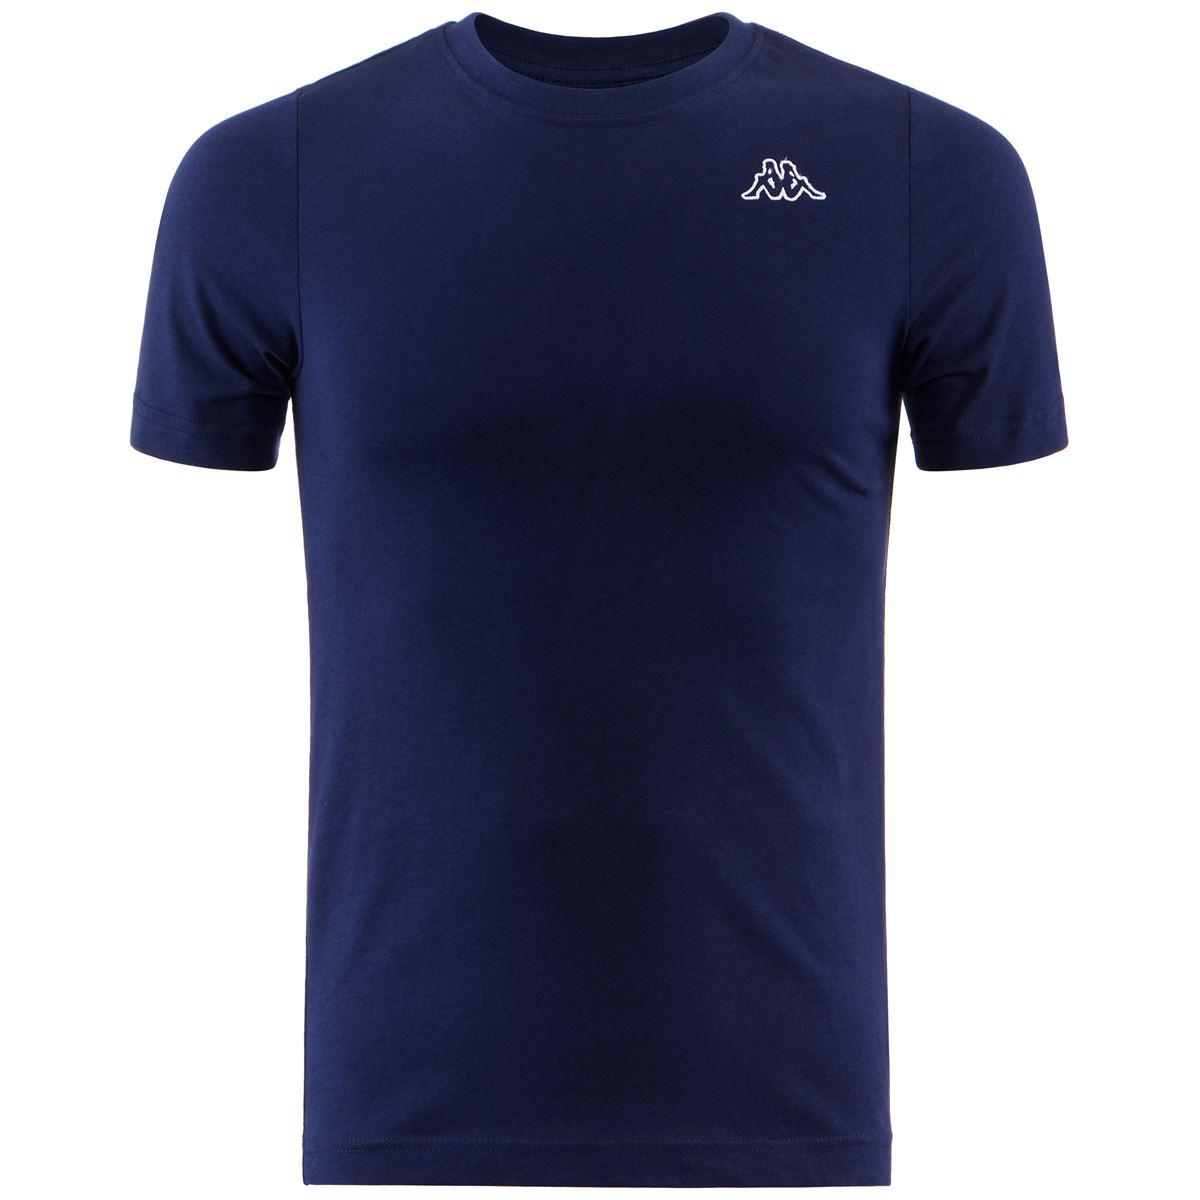 T-SHIRT KAPPA KAPPA   T-shirt m/m   304J150193